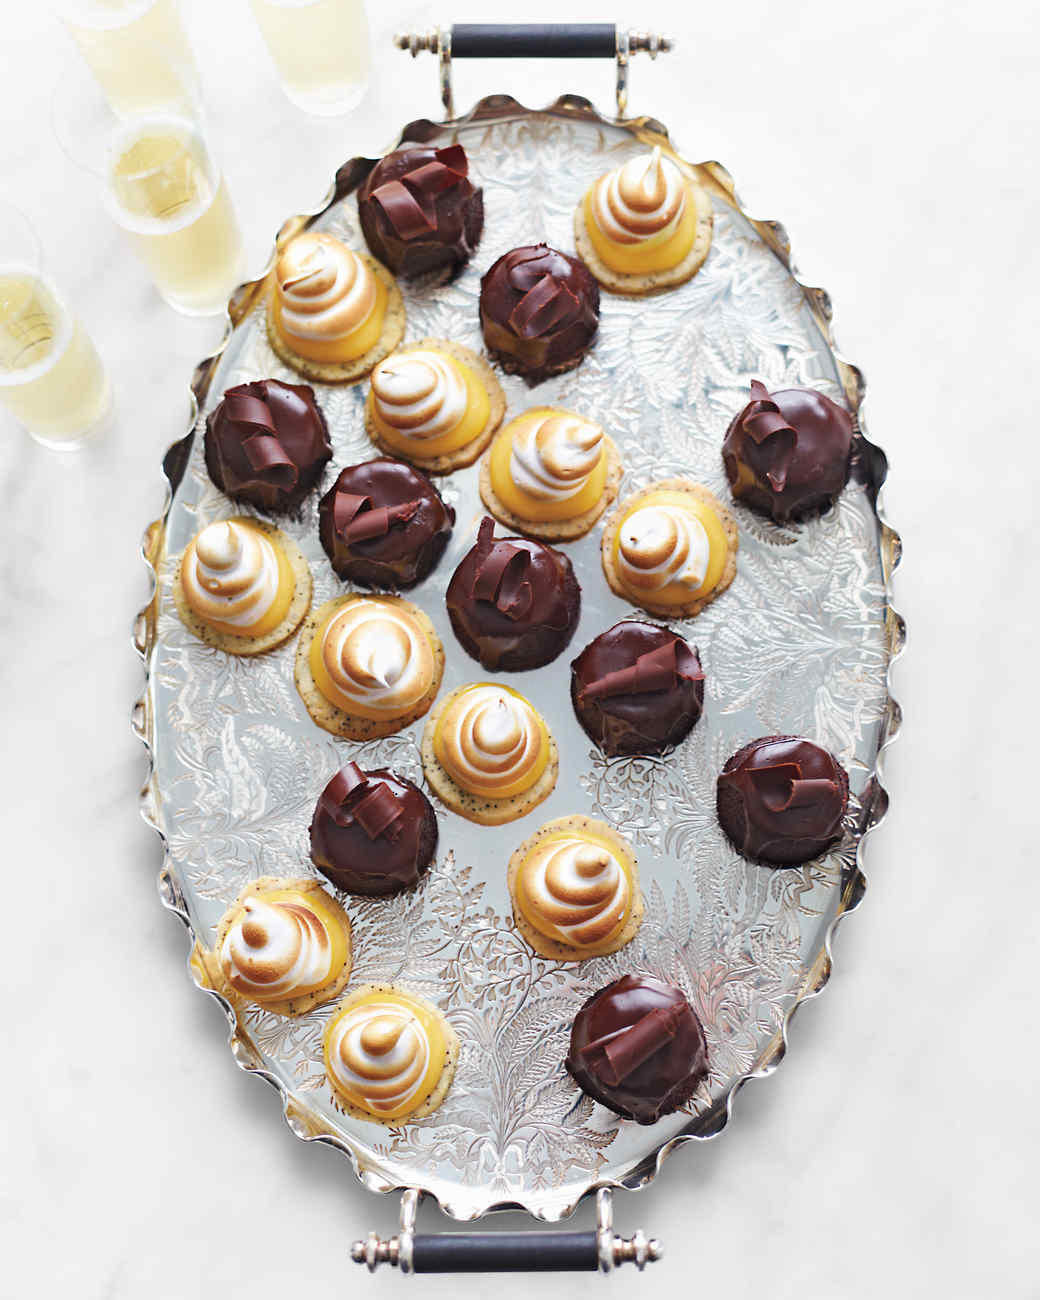 mini-chocolate-cakes-a130522-11-57985-md110267.jpg